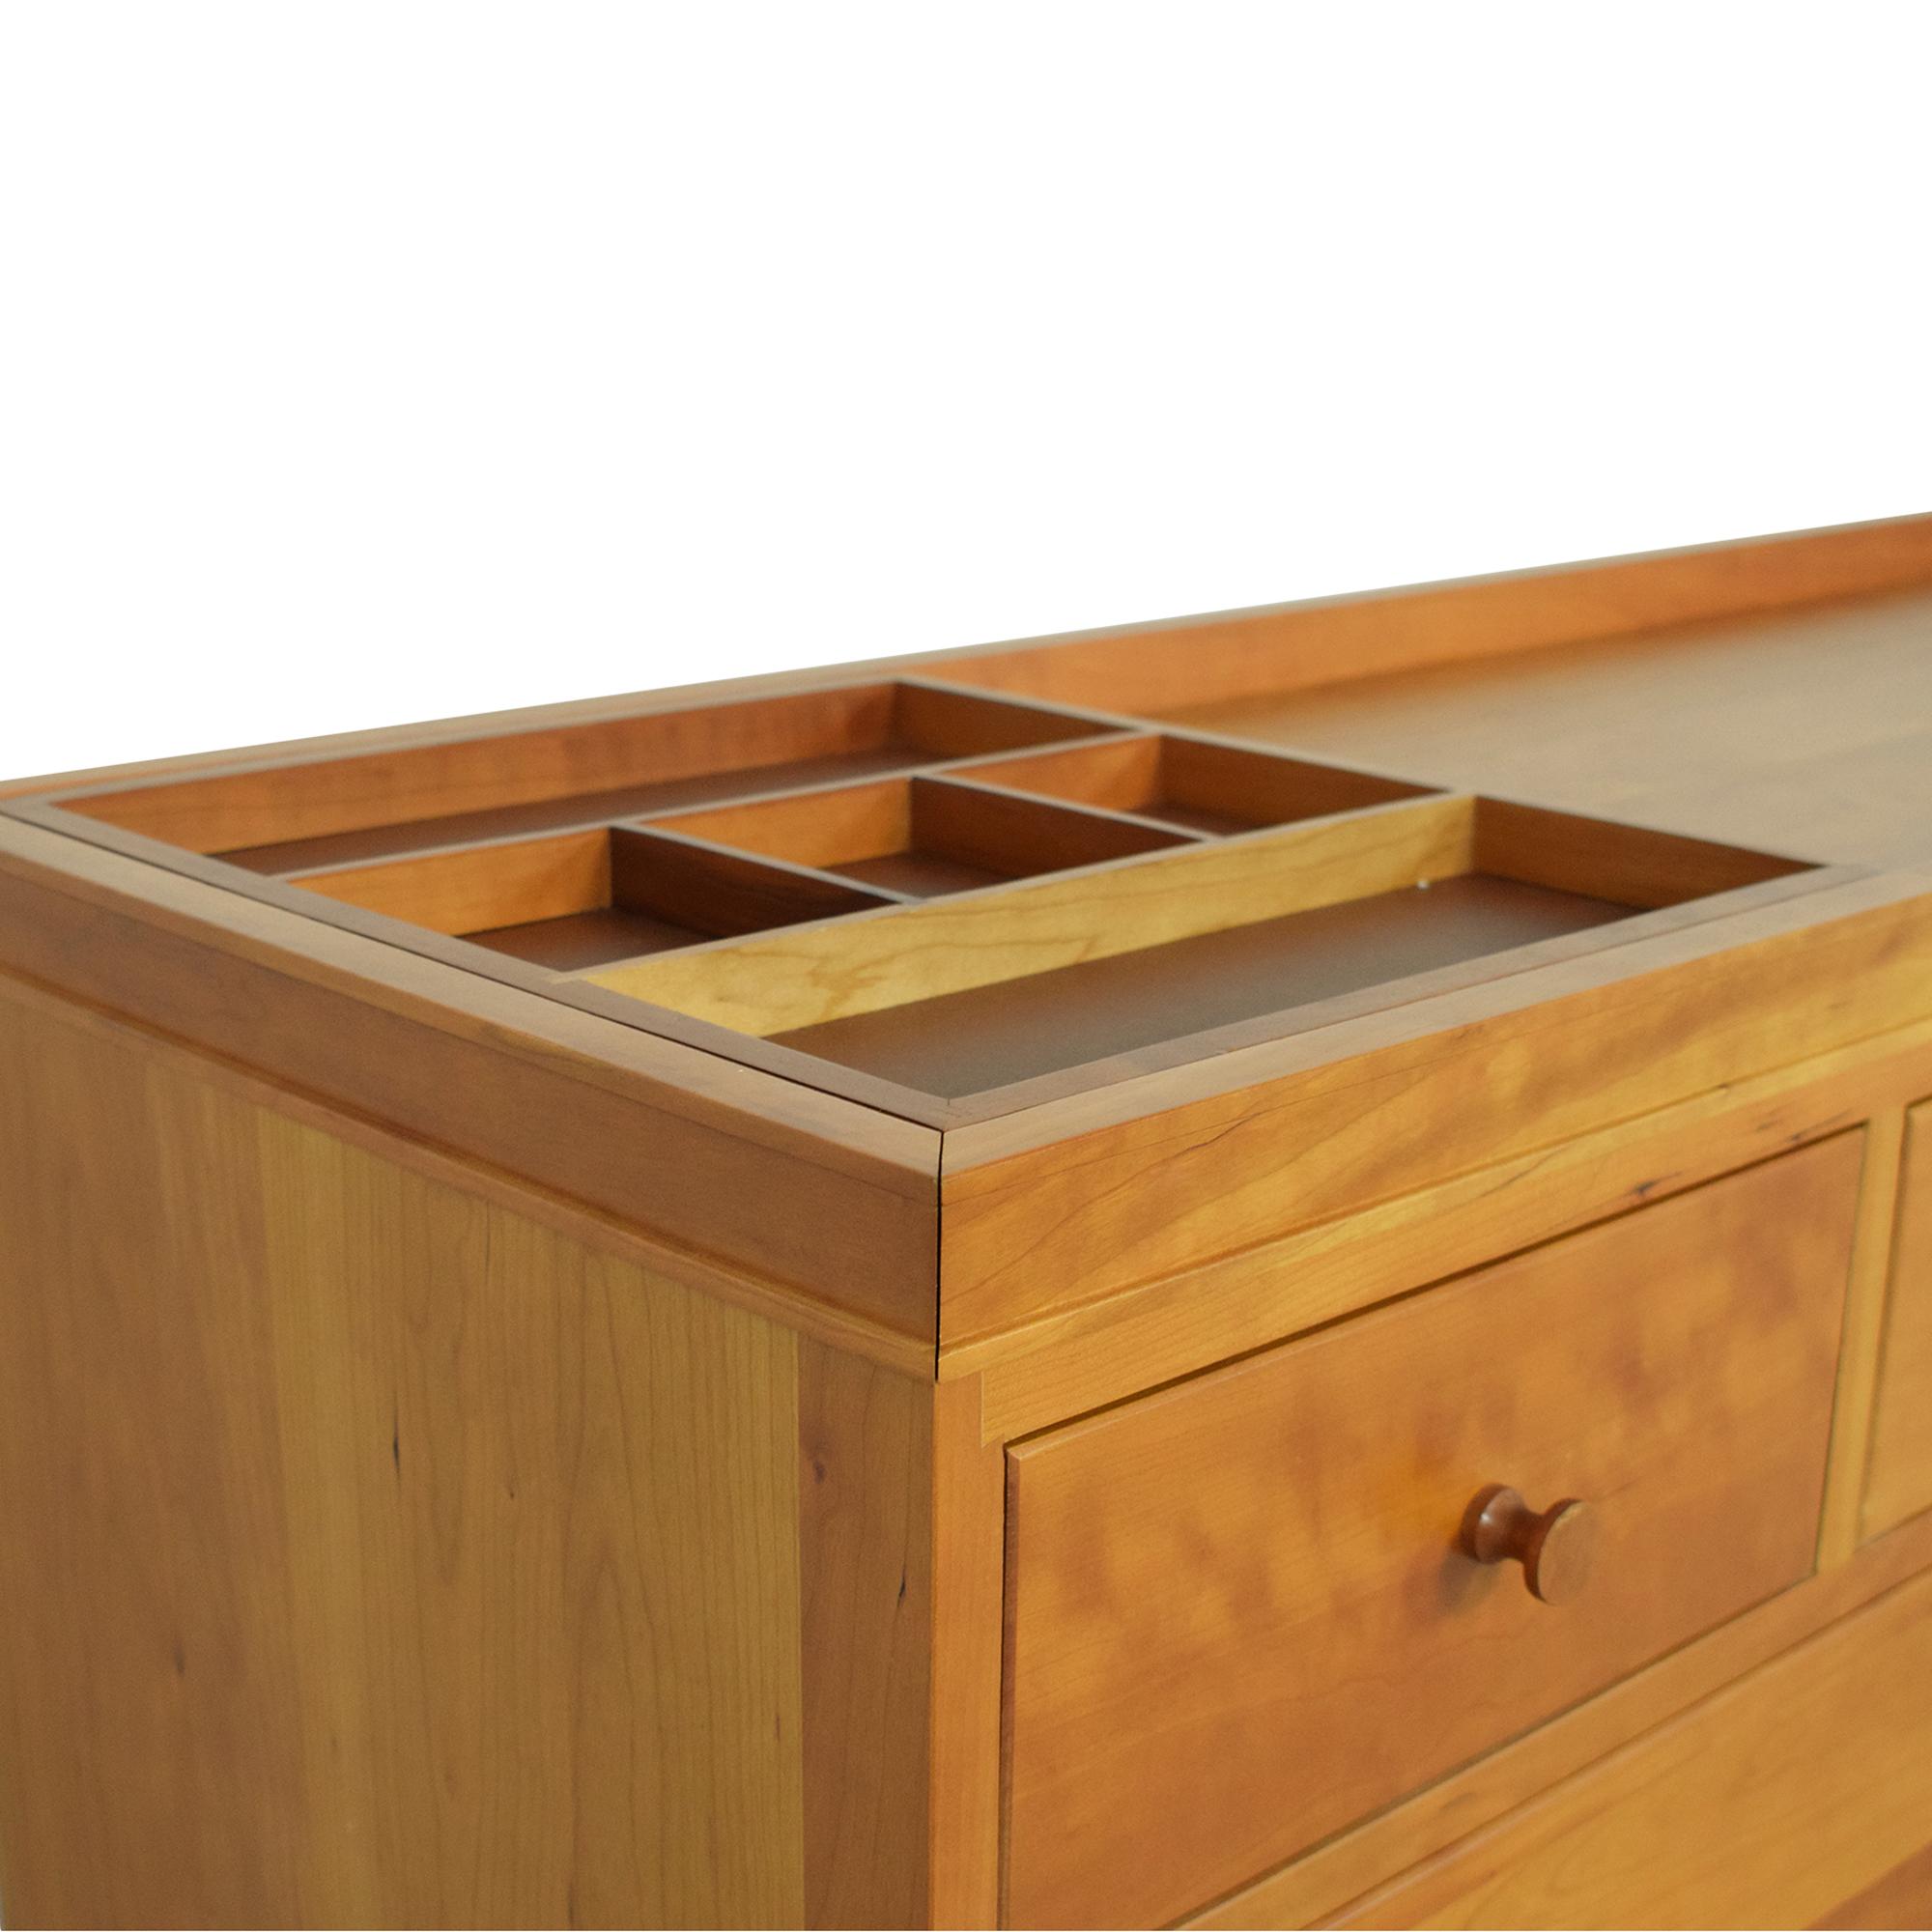 Crate & Barrel Crate & Barrel Cabot by Copeland Ten Drawer Dresser